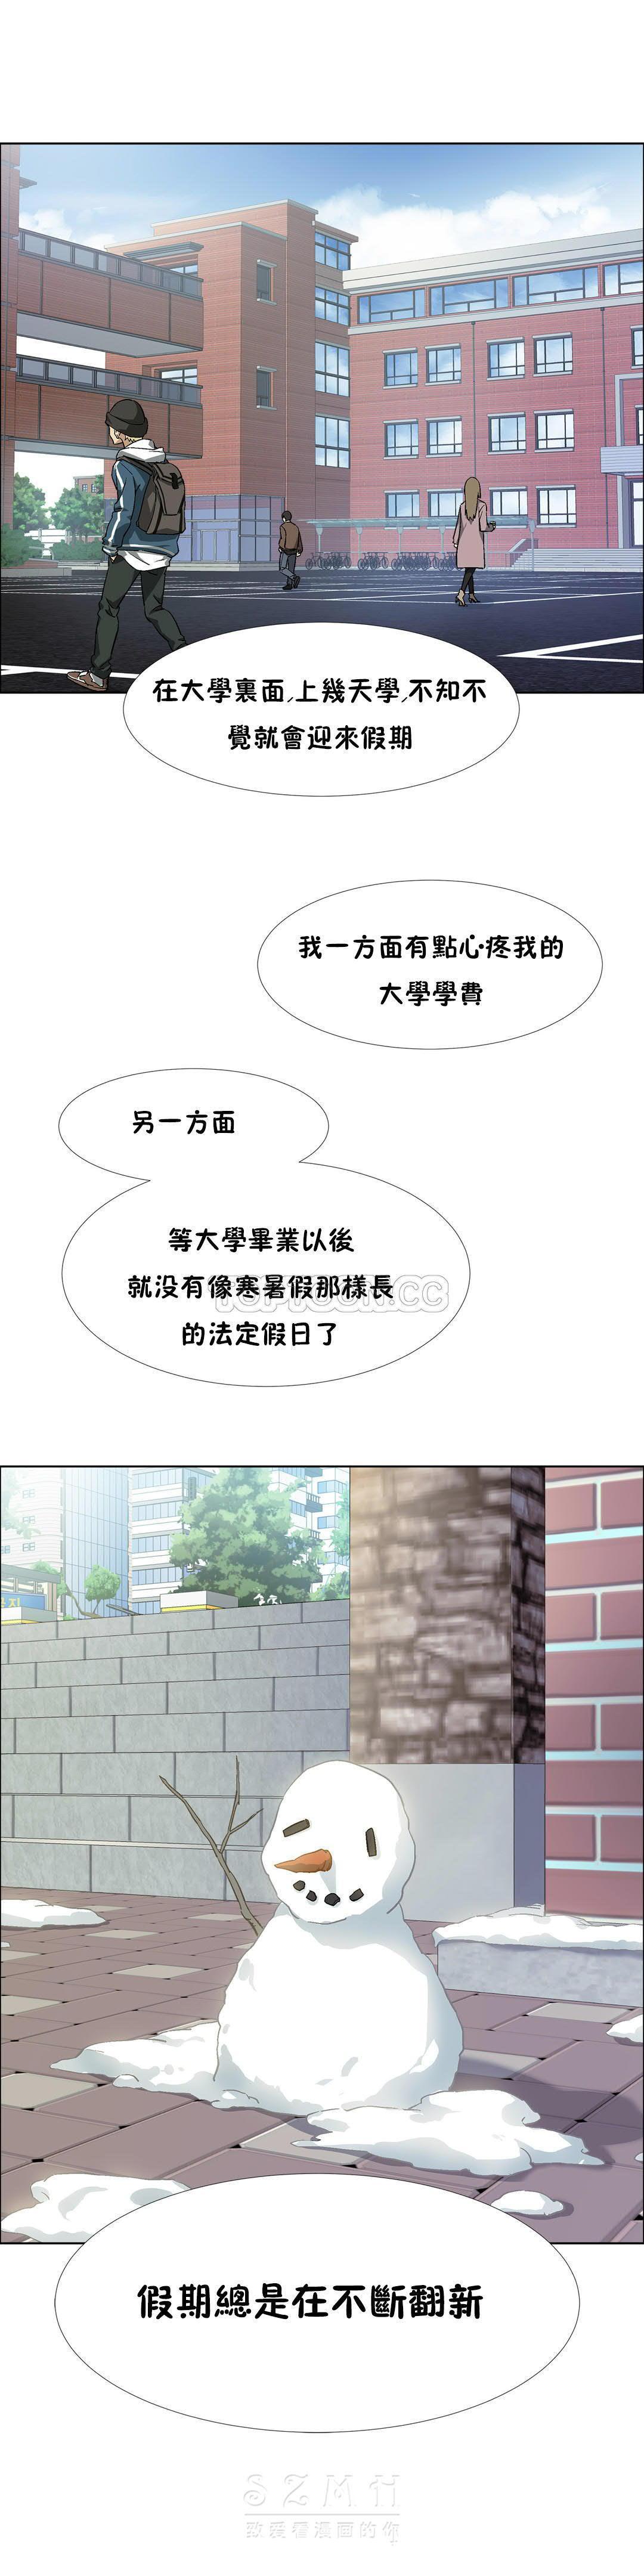 [Studio Wannabe] Rental Girls | 出租女郎 Ch. 33-58 [Chinese]  第二季 完结 10